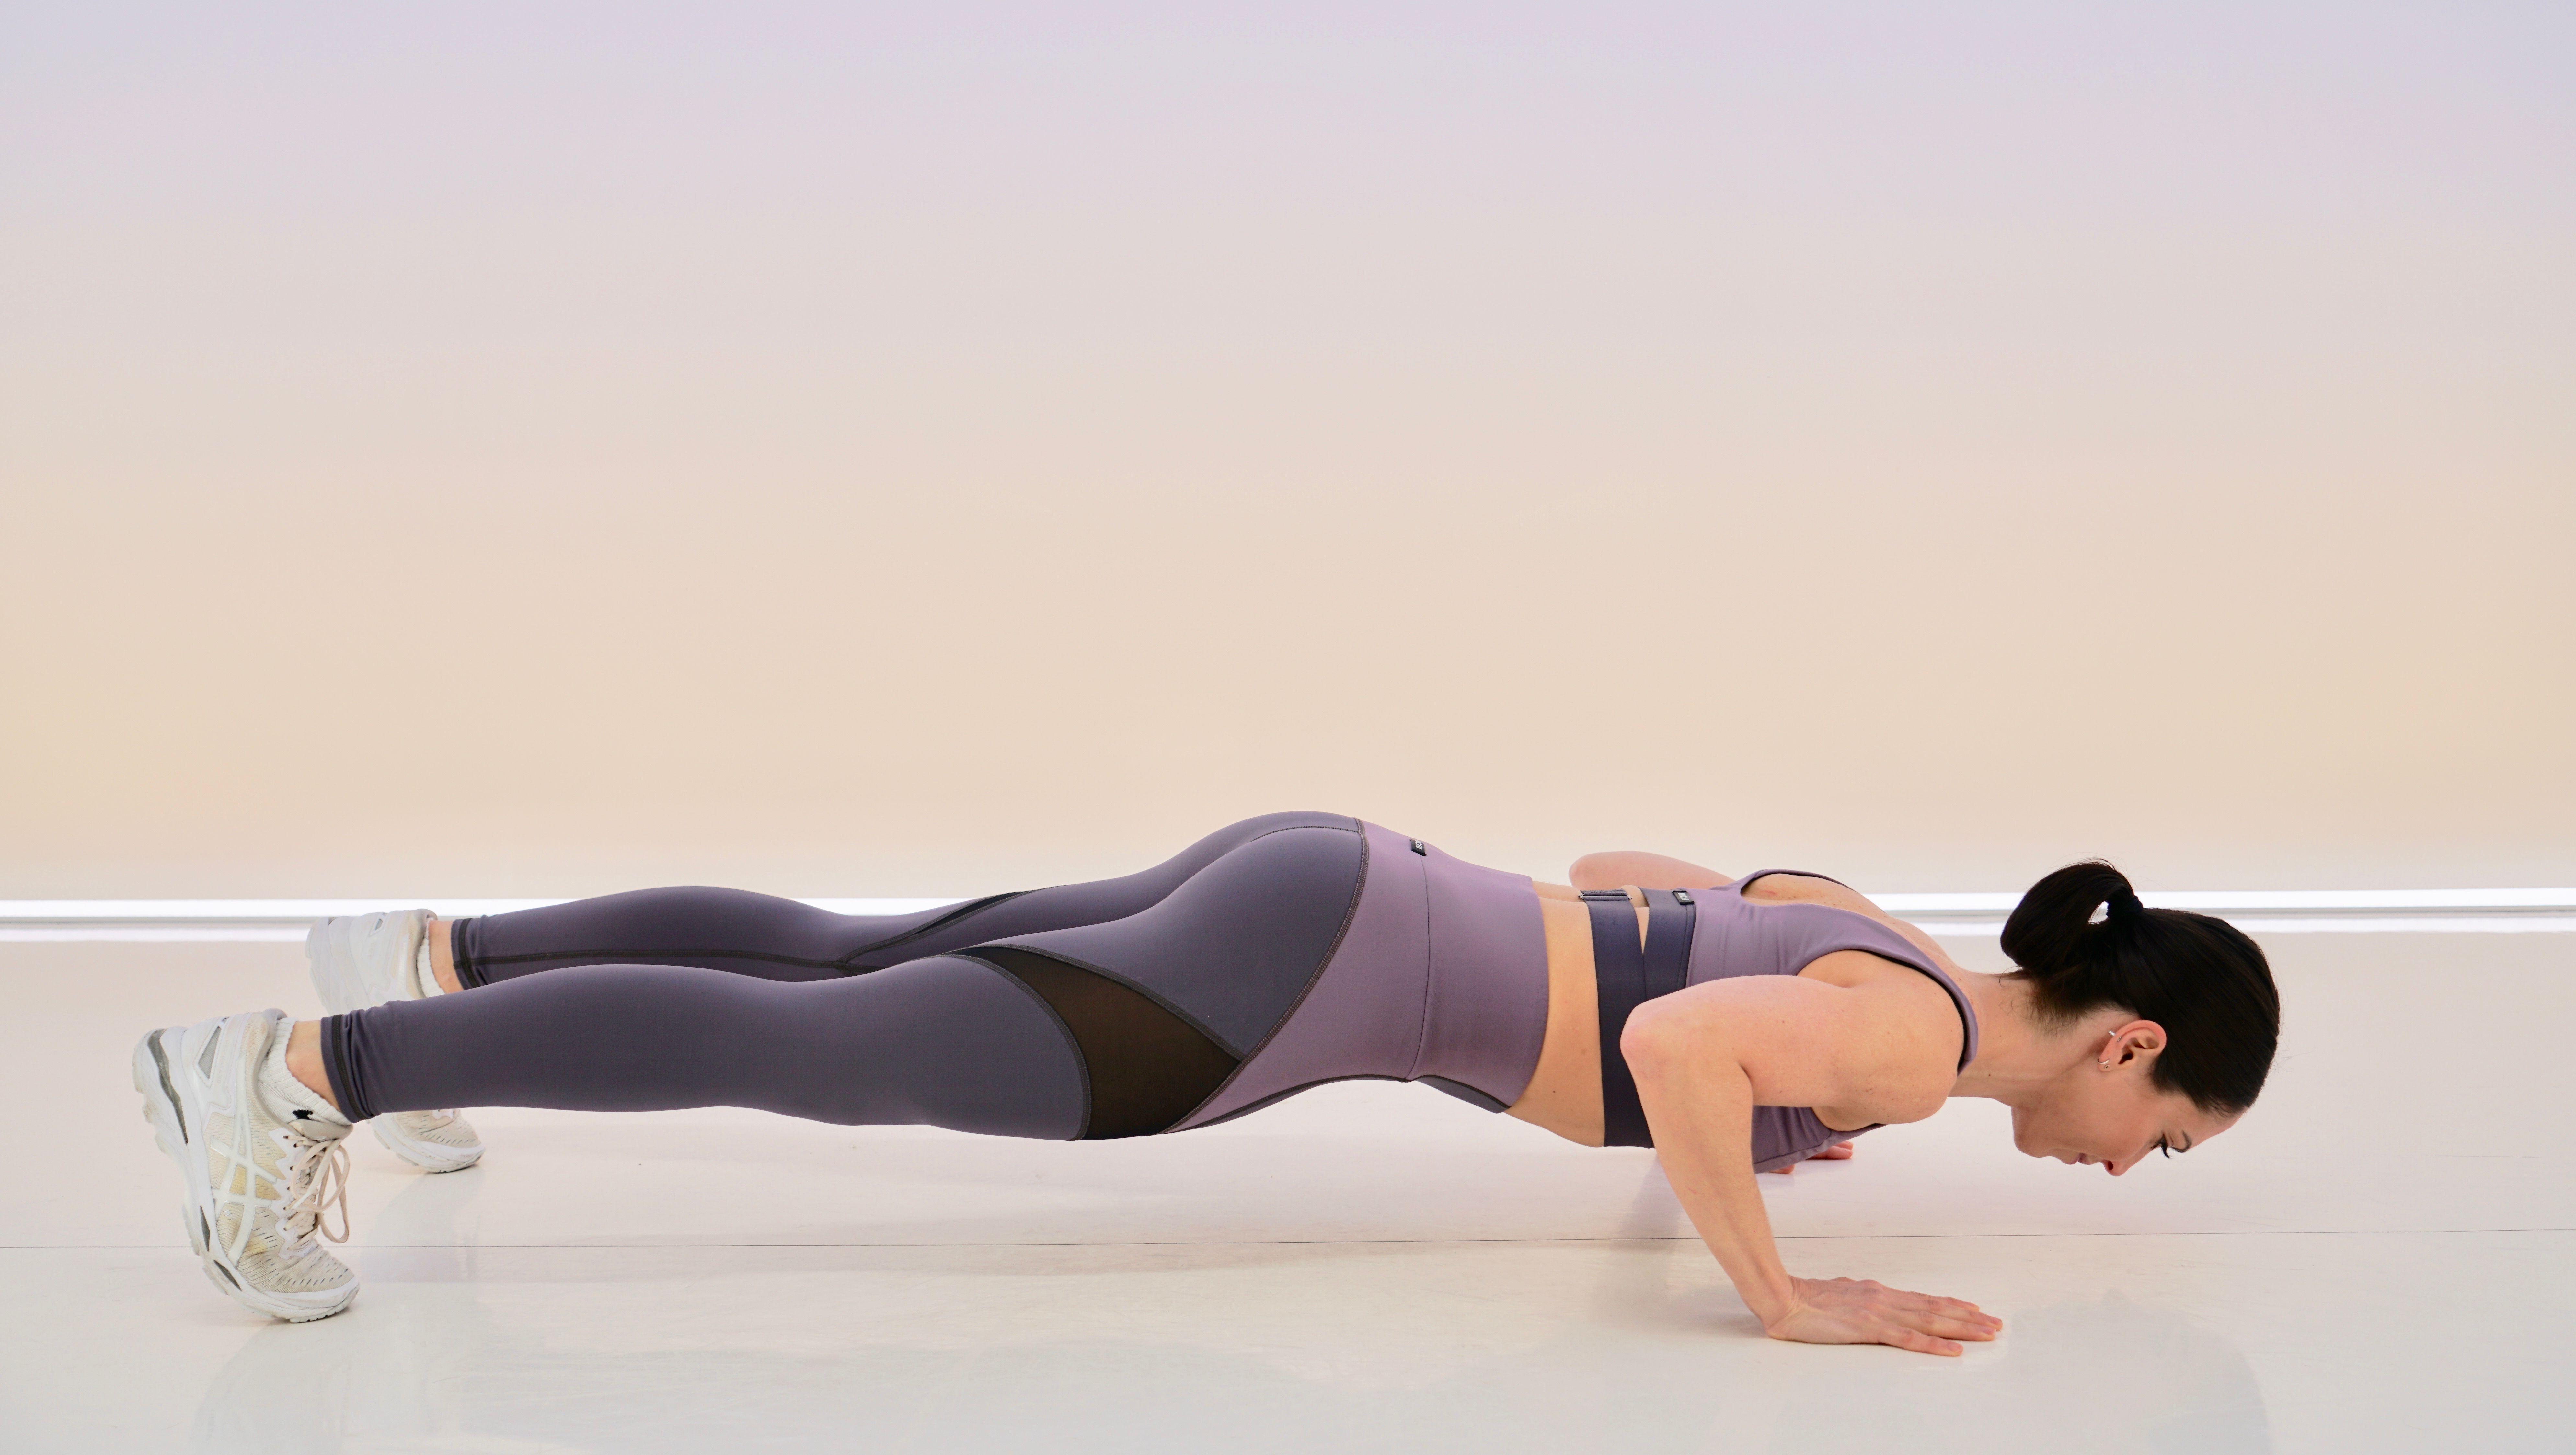 upper-body workout: push-ups